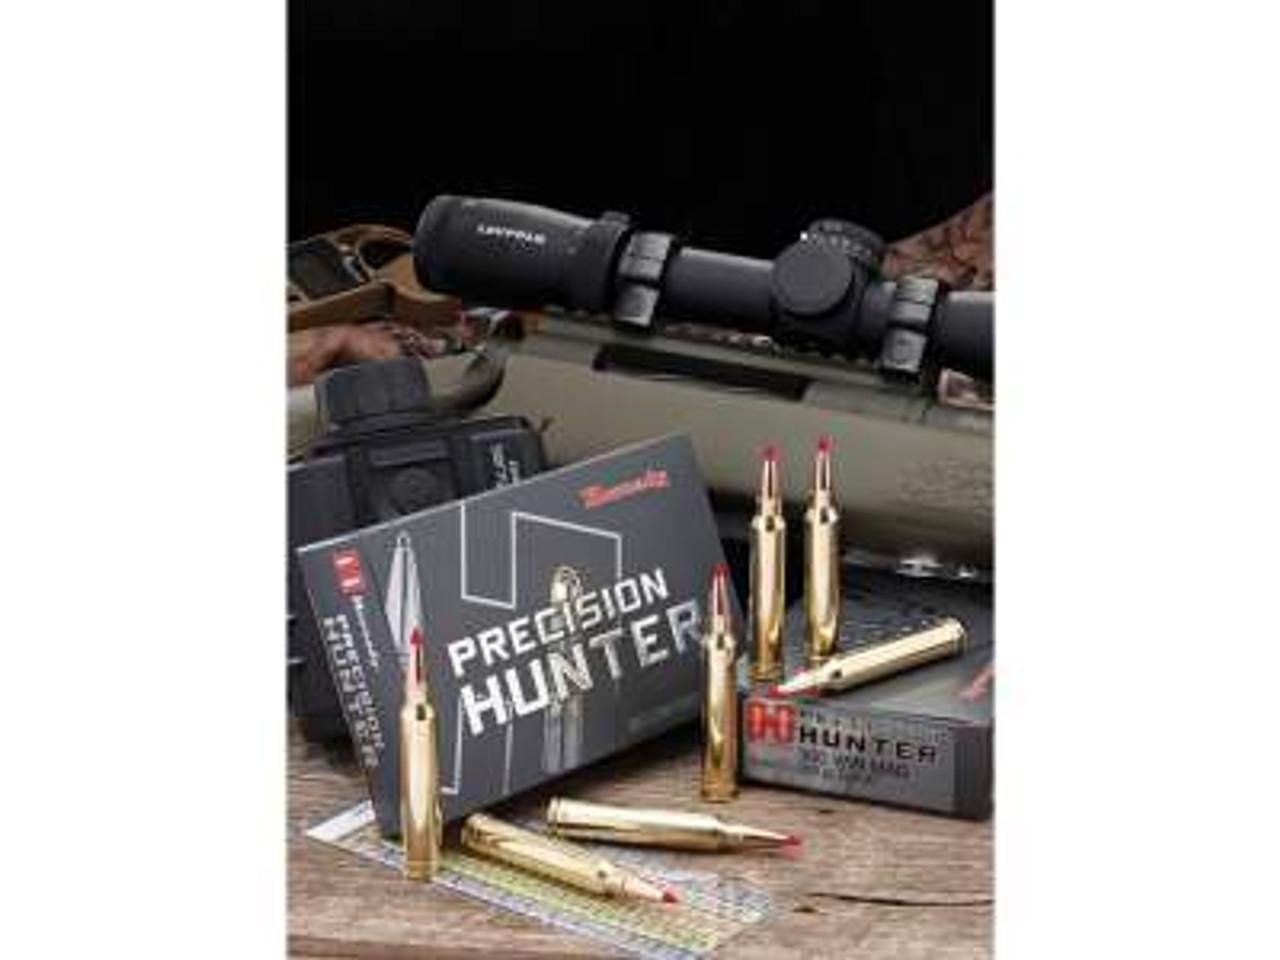 30-378 Wby Mag Ammo